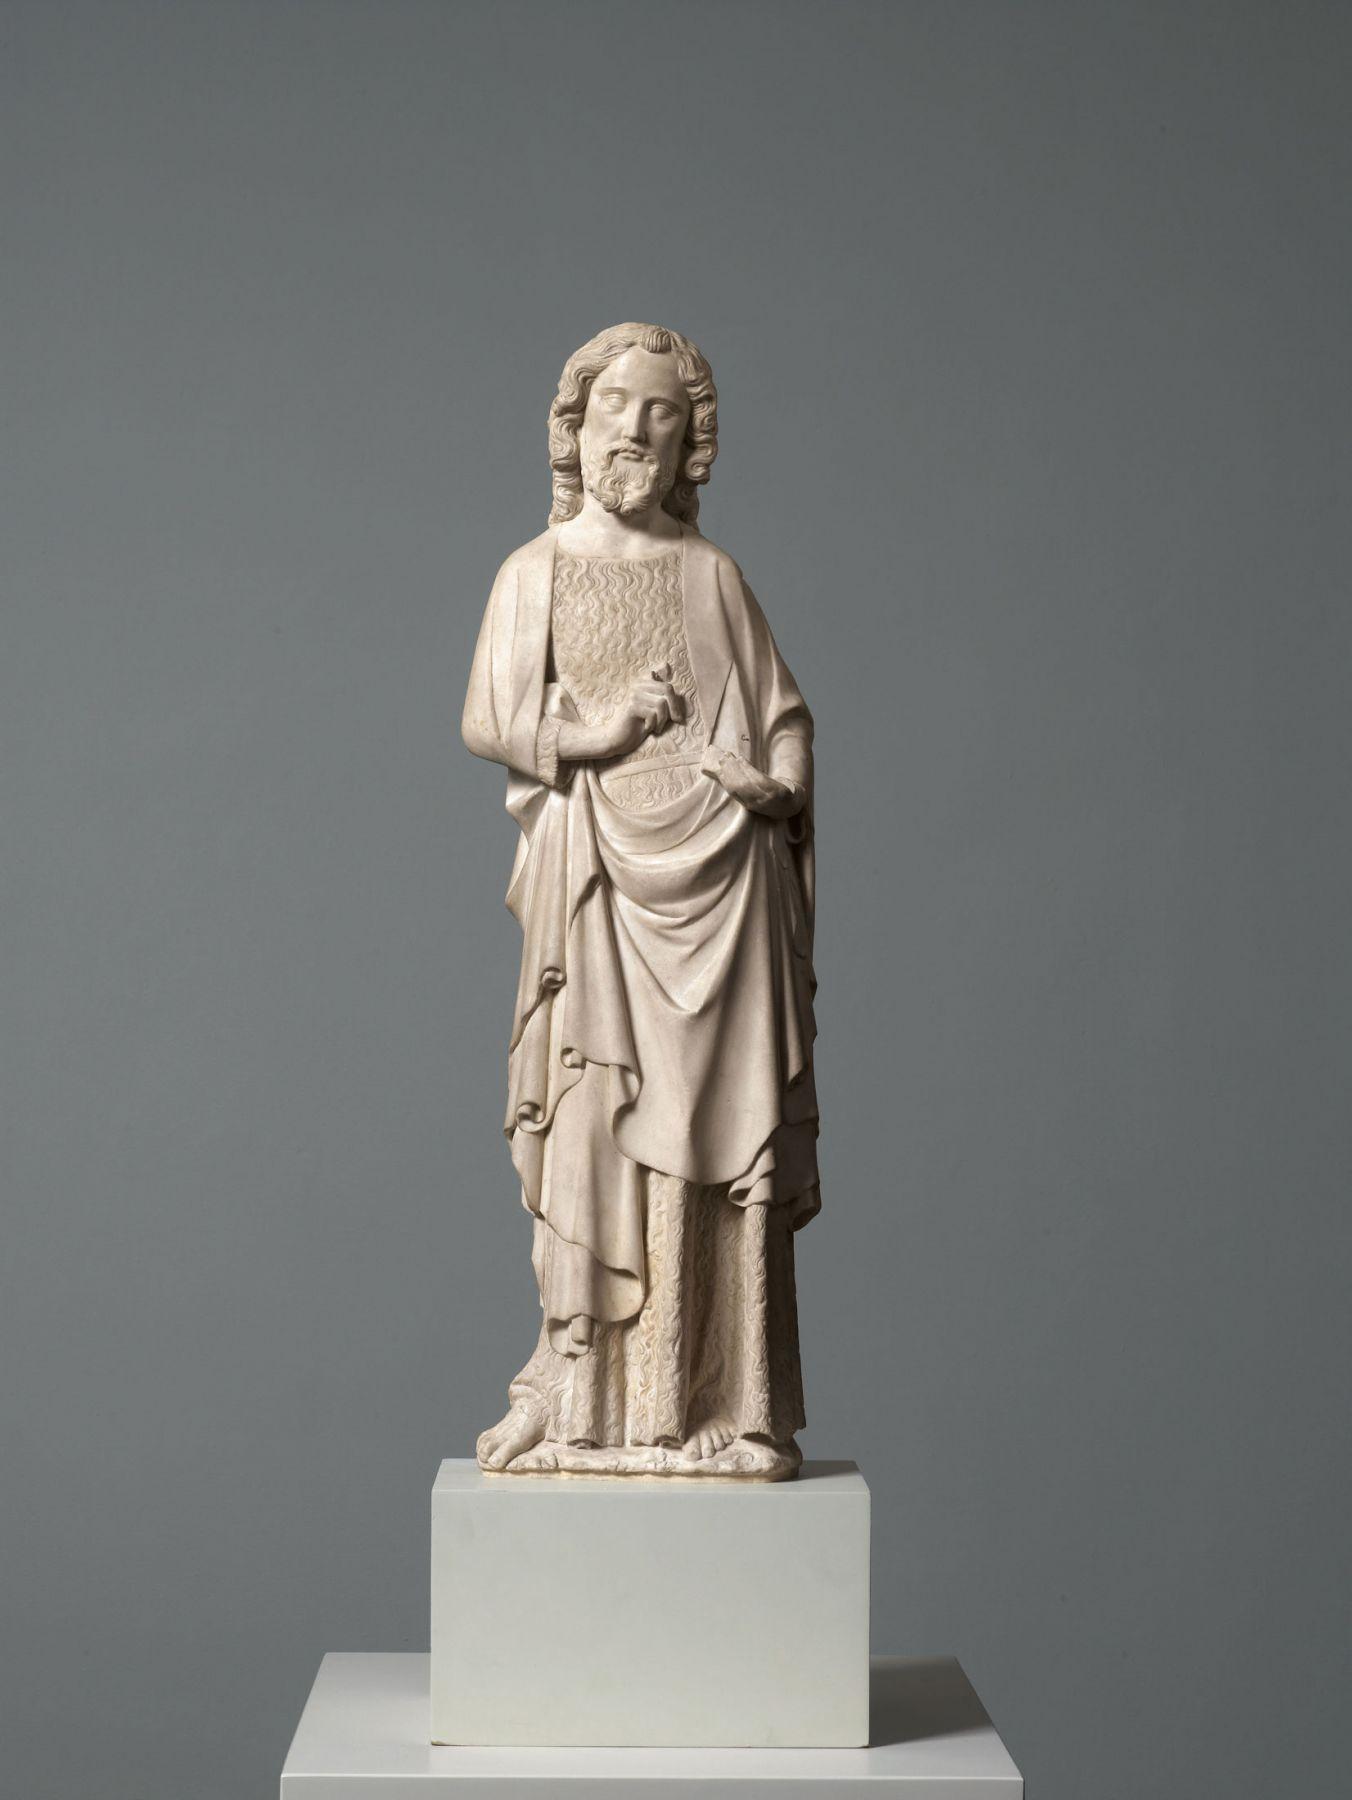 Robert de Lannoy(fl. from 1292, d. Paris? 1356, attributed), John the Baptist